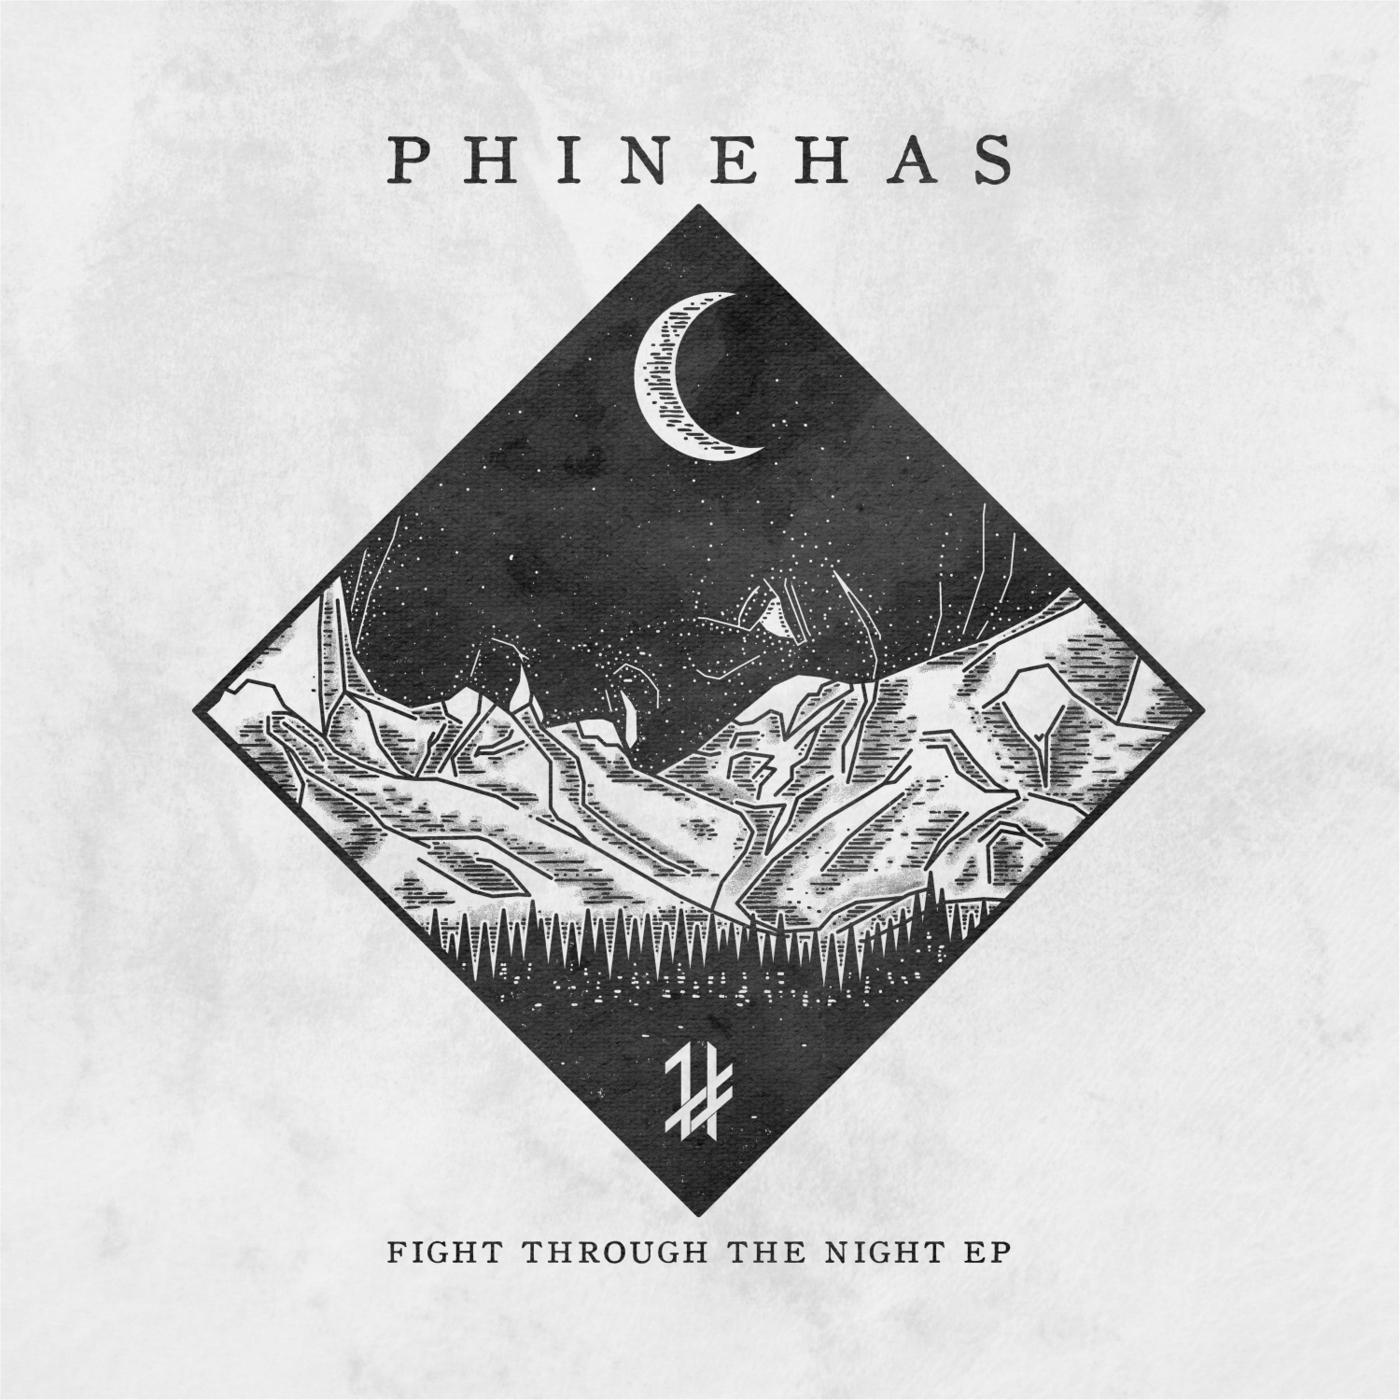 Phinehas - Fight Through the Night [EP] (2016)